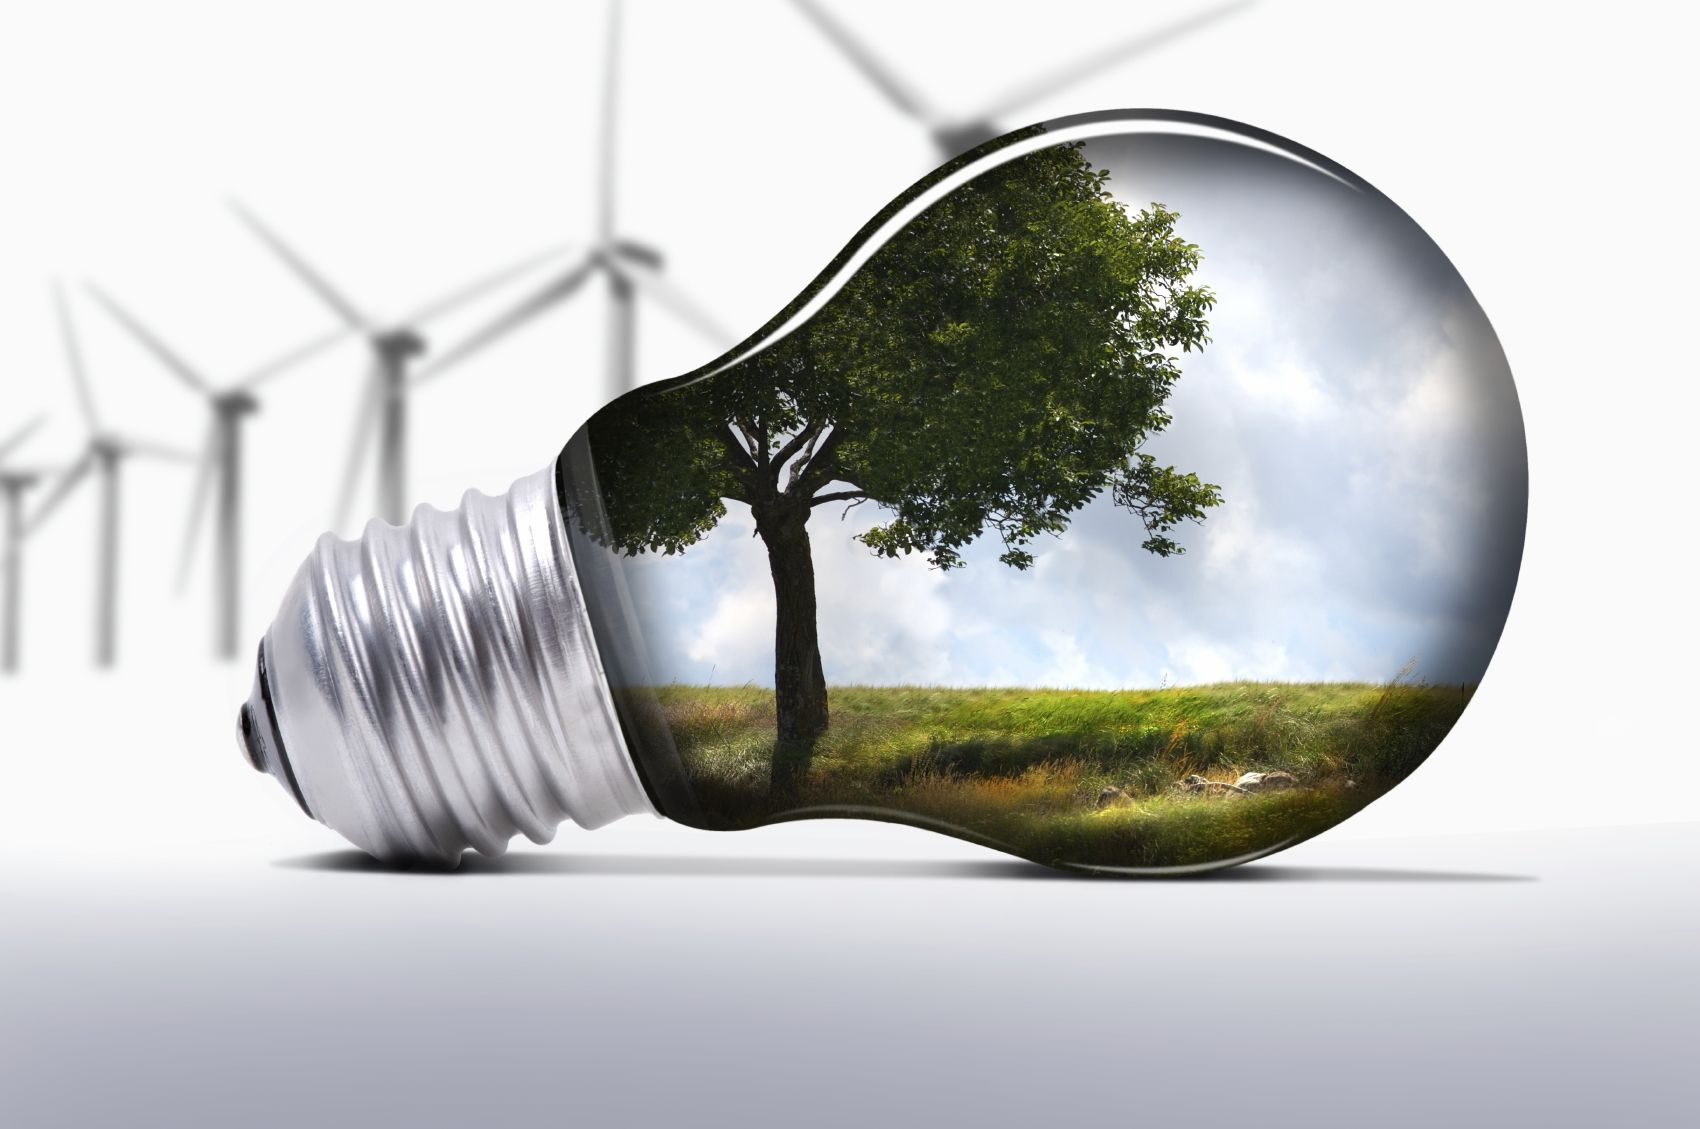 Eurostat: Στο 15,4% η κατανάλωση «πράσινης» ενέργειας στην Ελλάδα